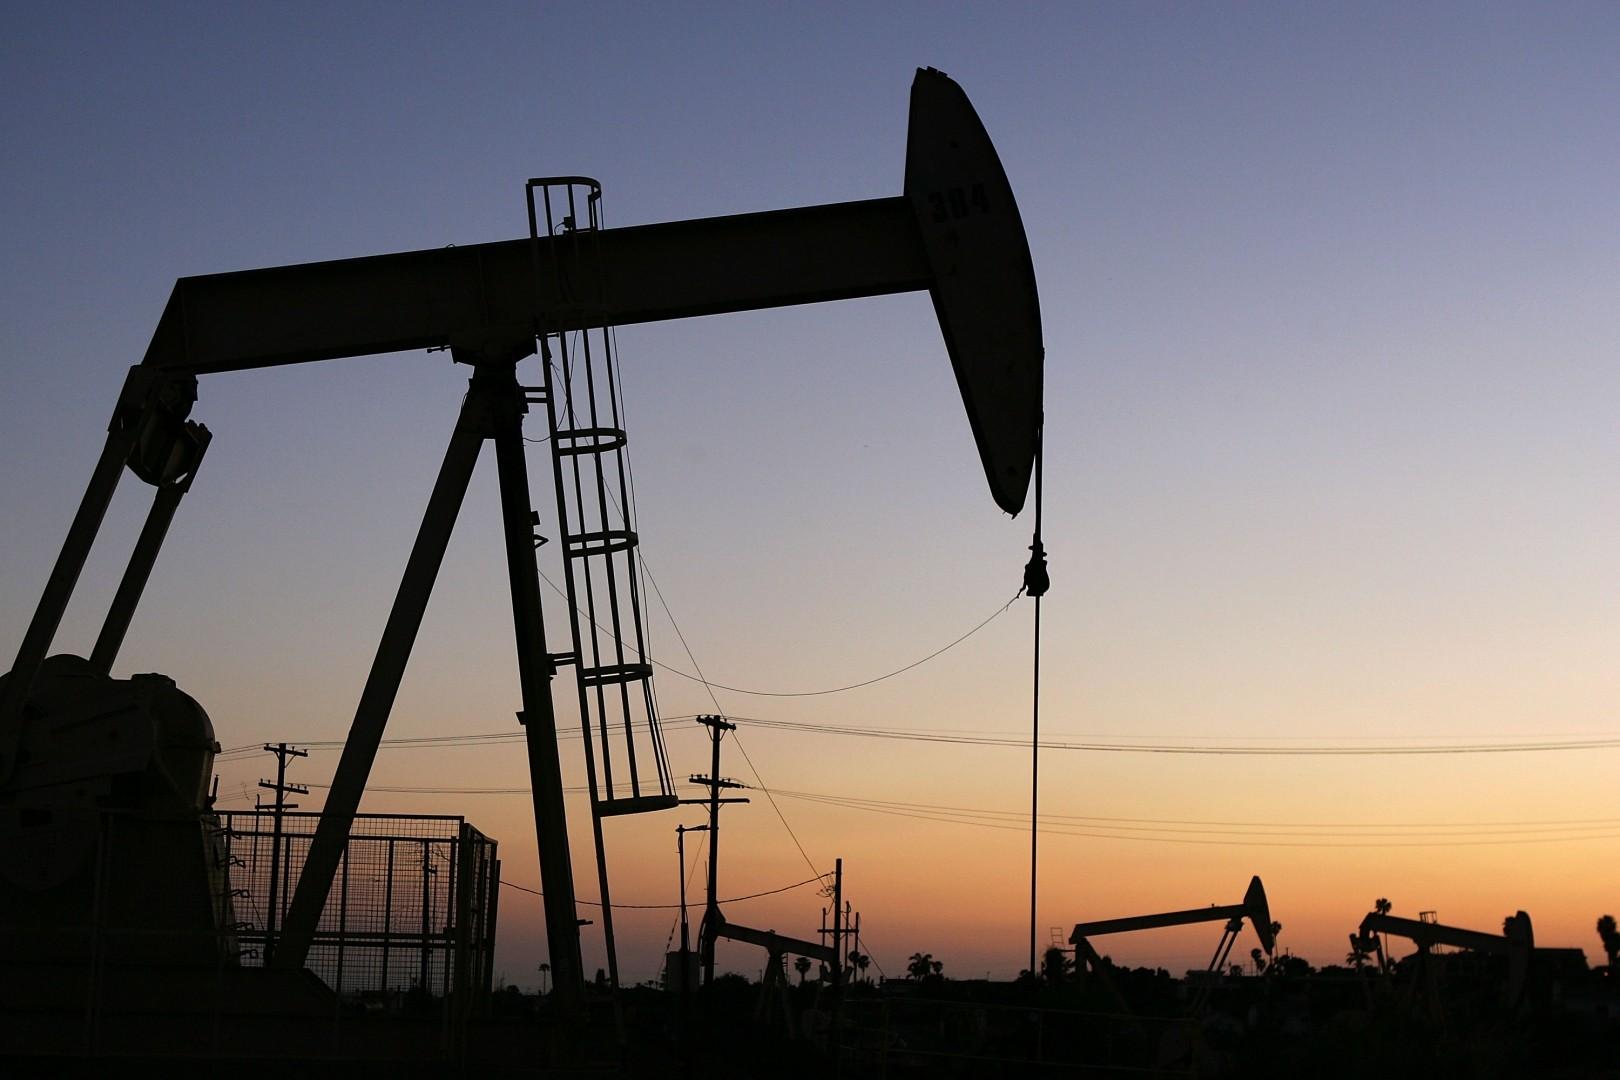 Цены нанефть слабо растут, Brent закрепилась выше $62 забаррель